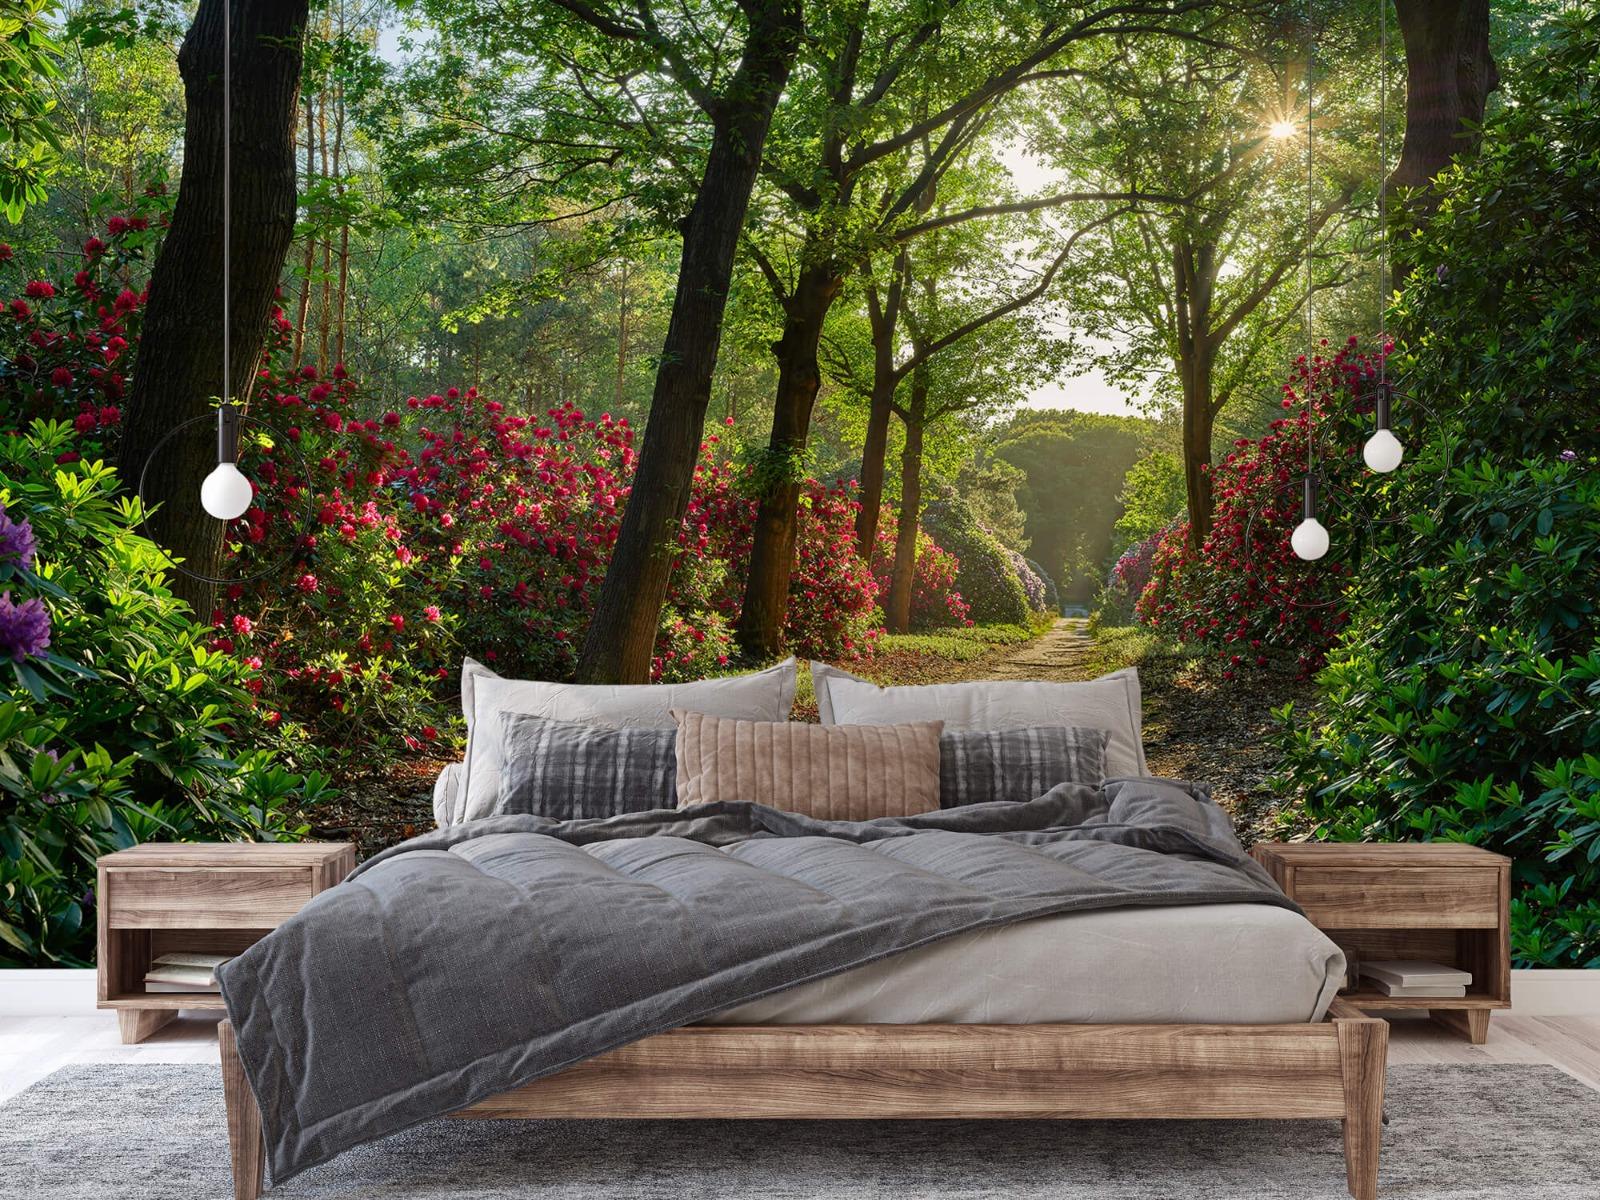 Bos - Zonsopkomst bij pad met rhododendrons 4